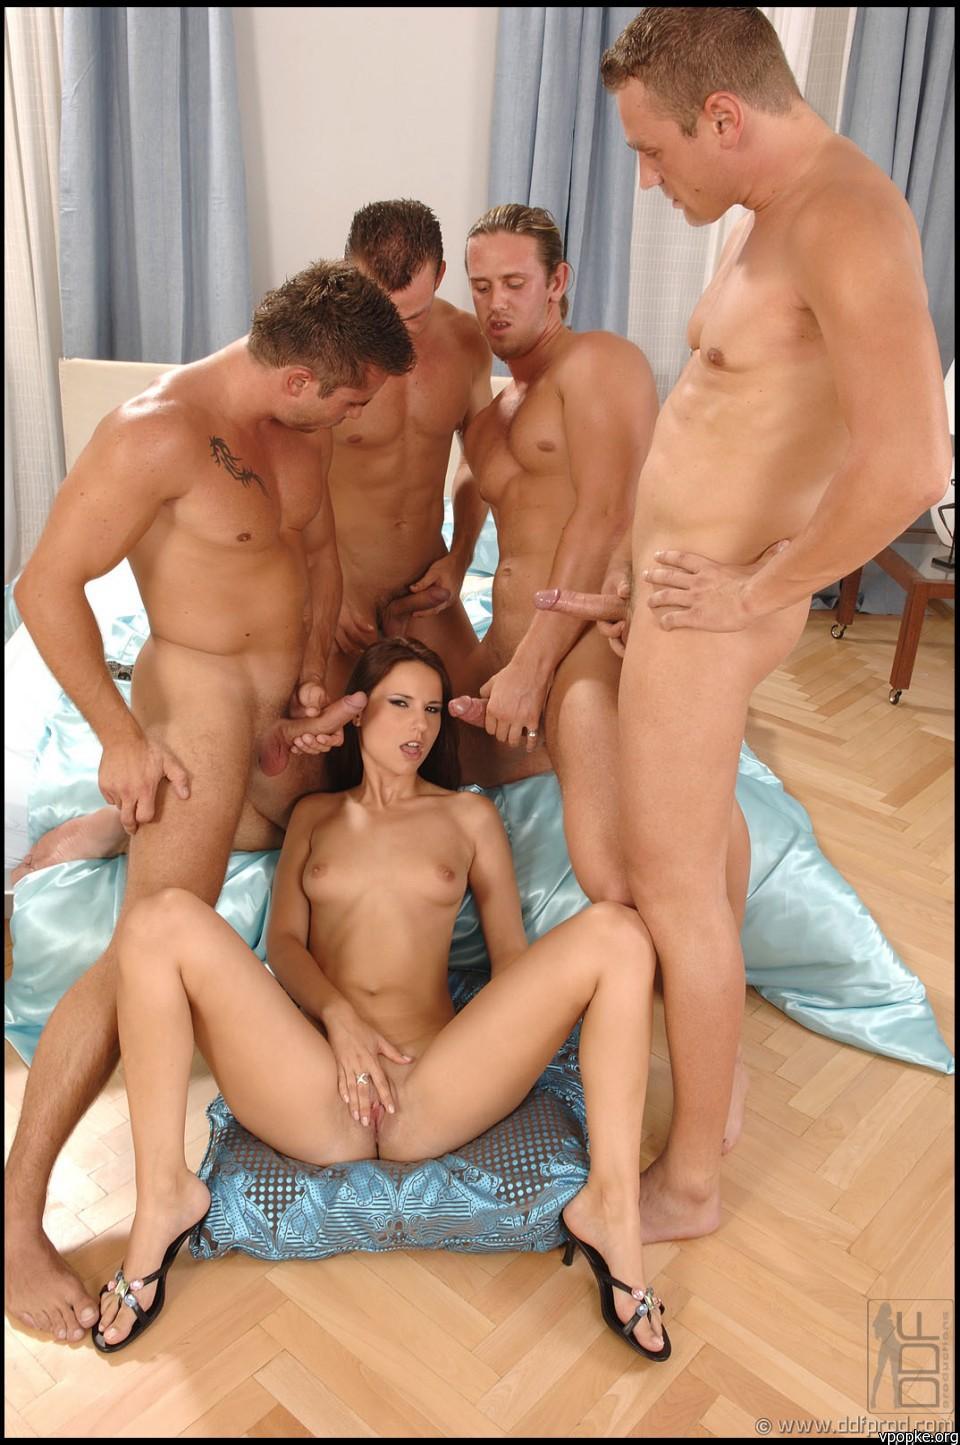 Секс с взрослыми мужчинами онлайн 5 фотография